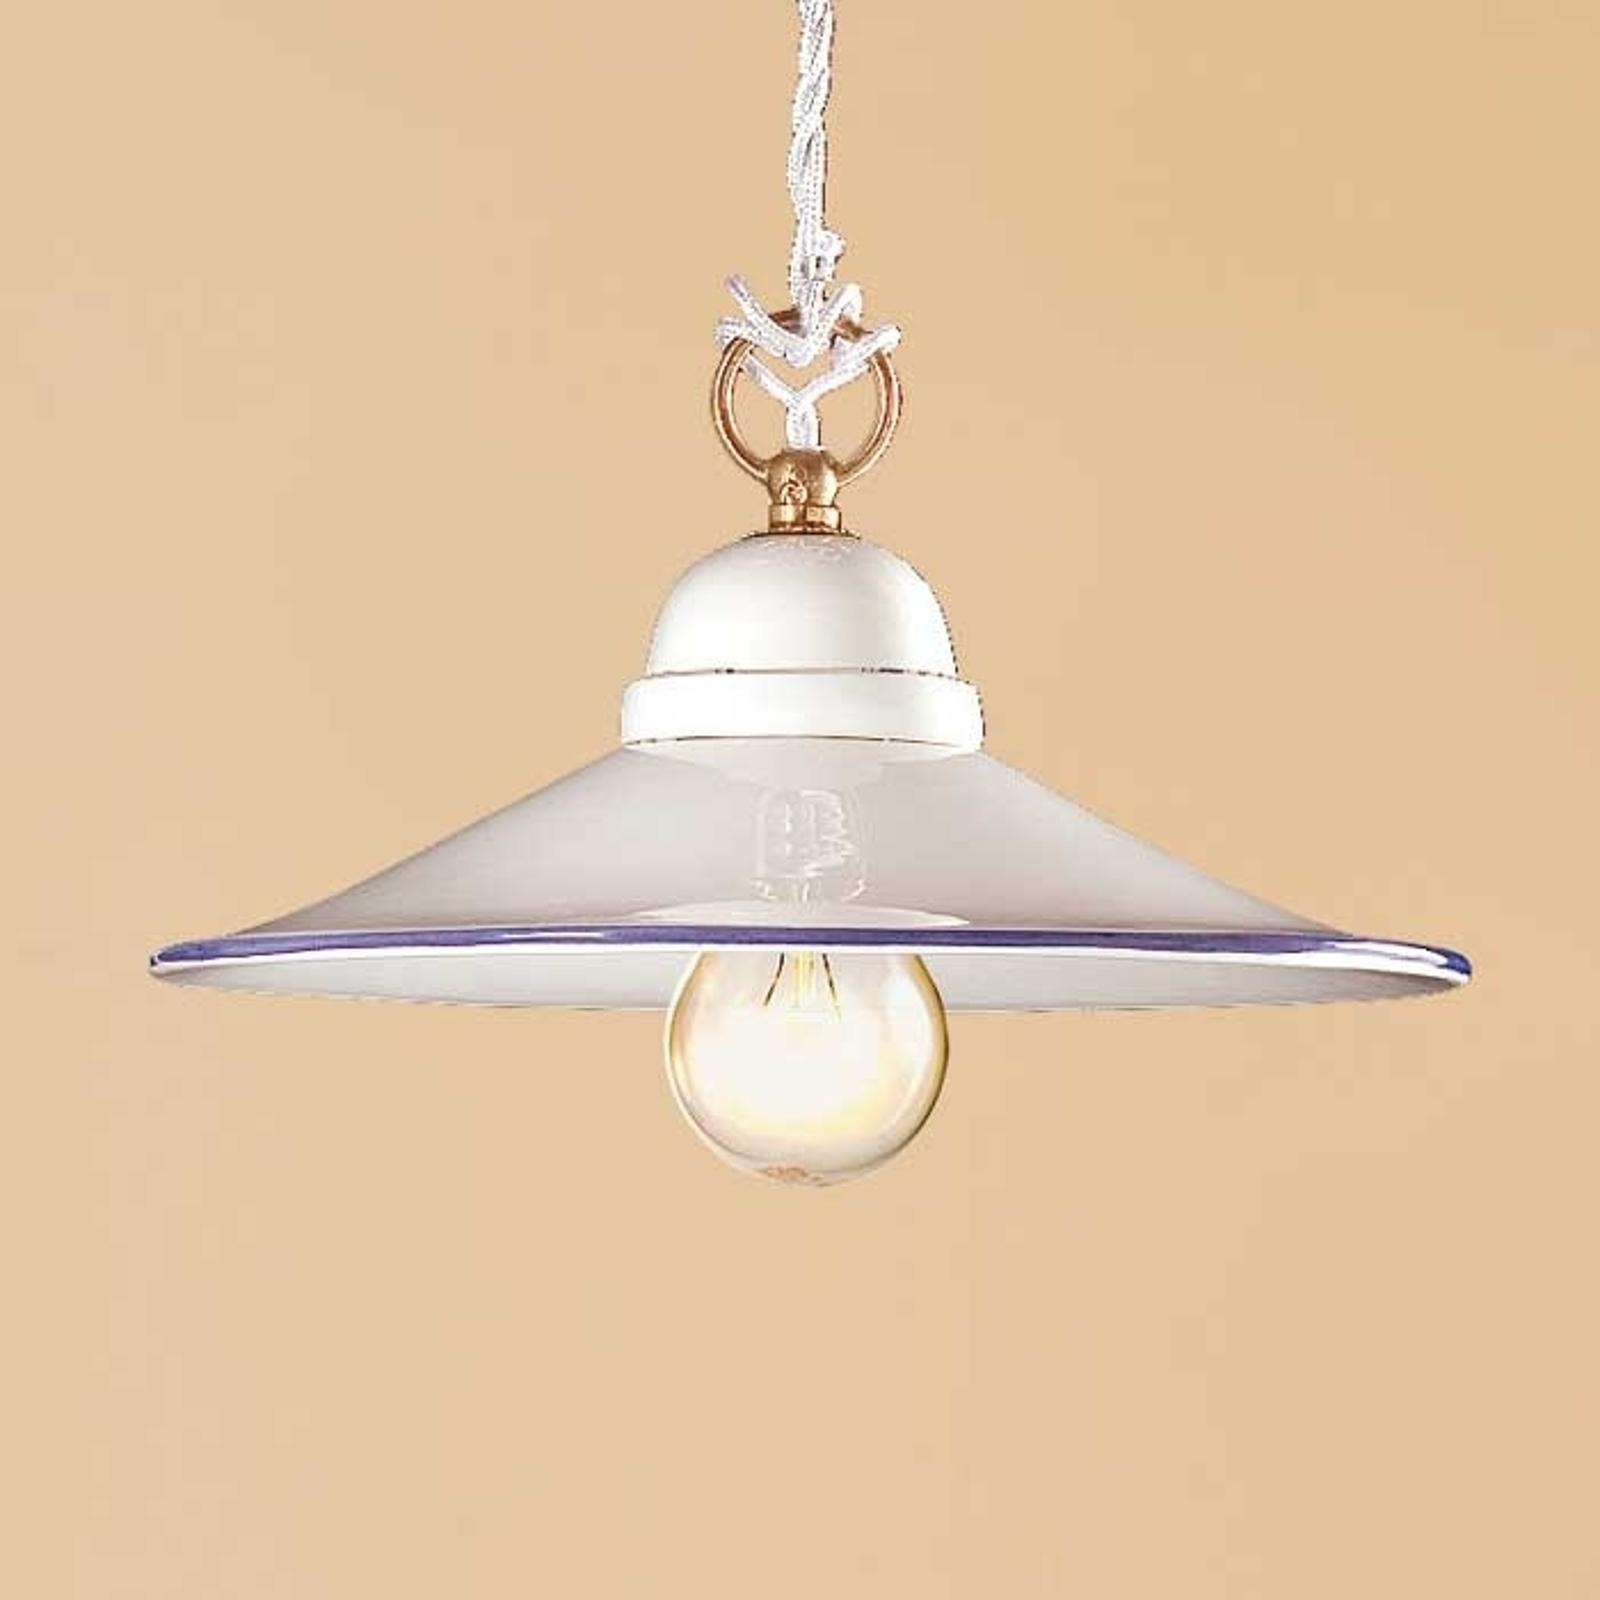 Hermosa lámpara colgante PIATTO de cerámica 28 cm